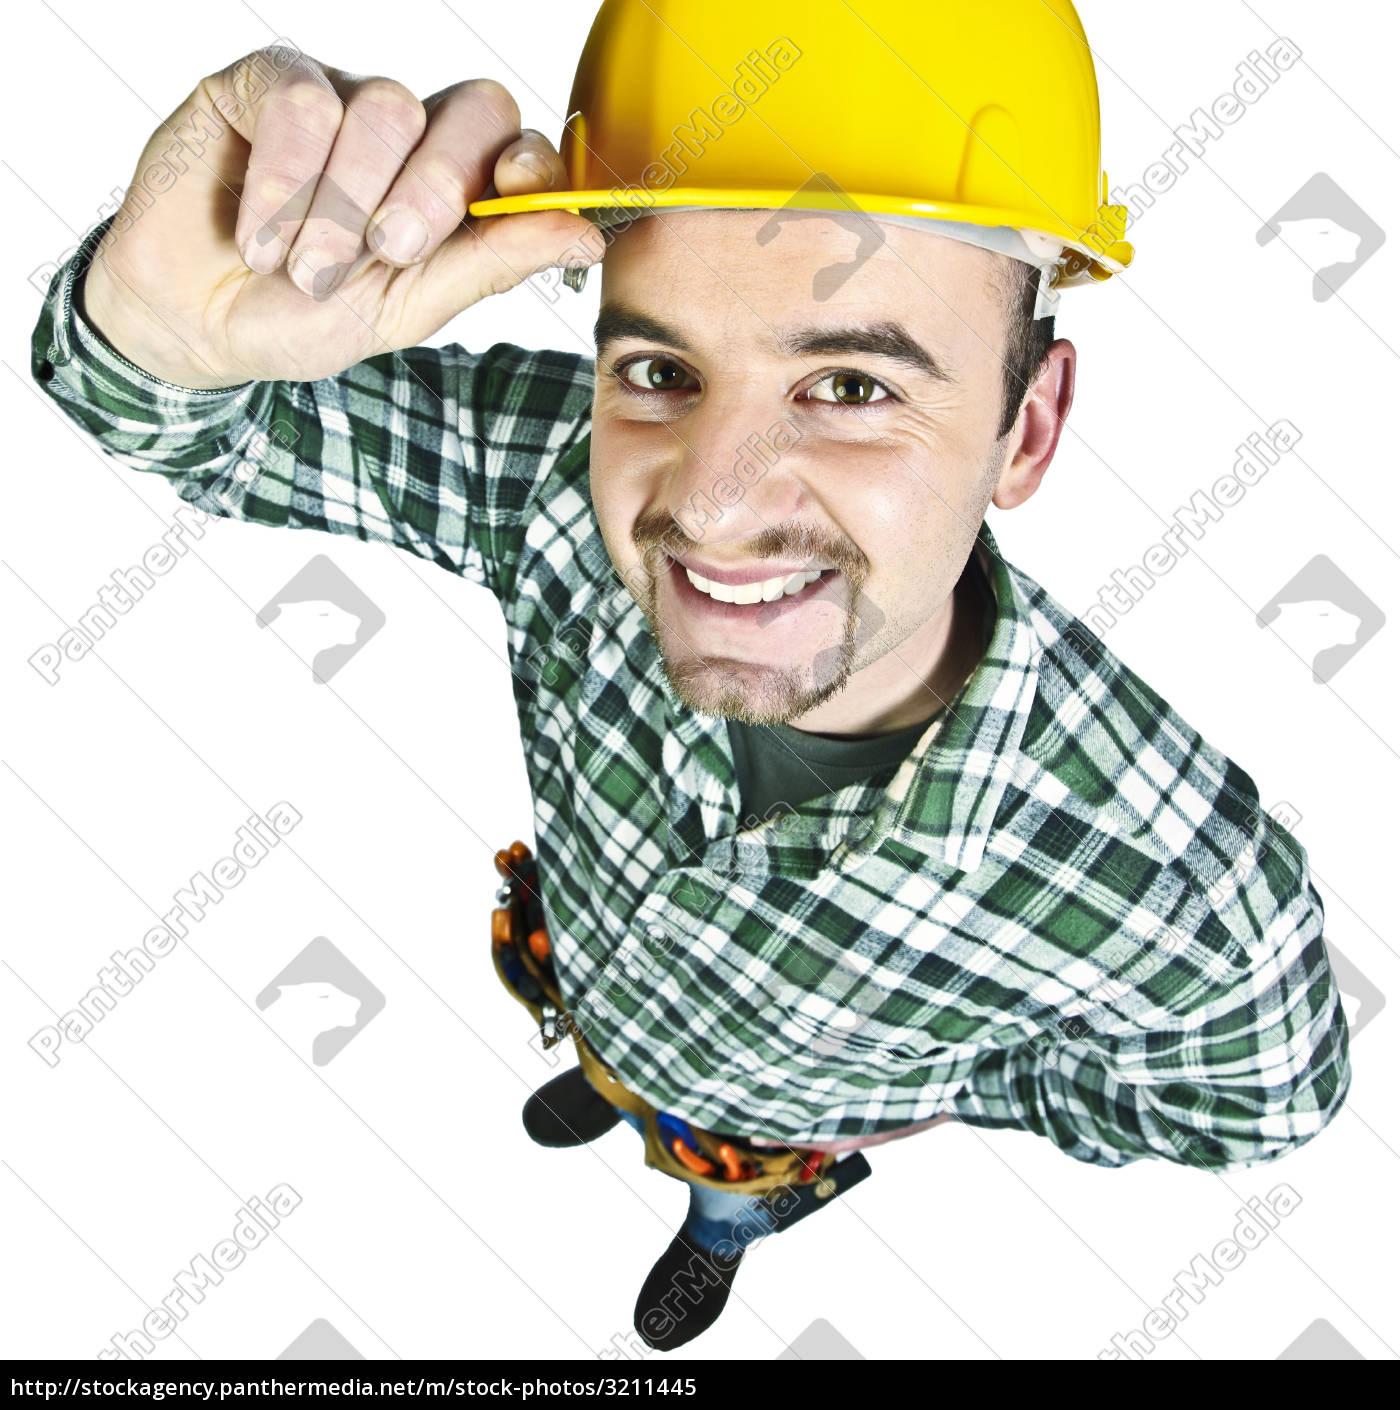 happy, funny, handyman - 3211445